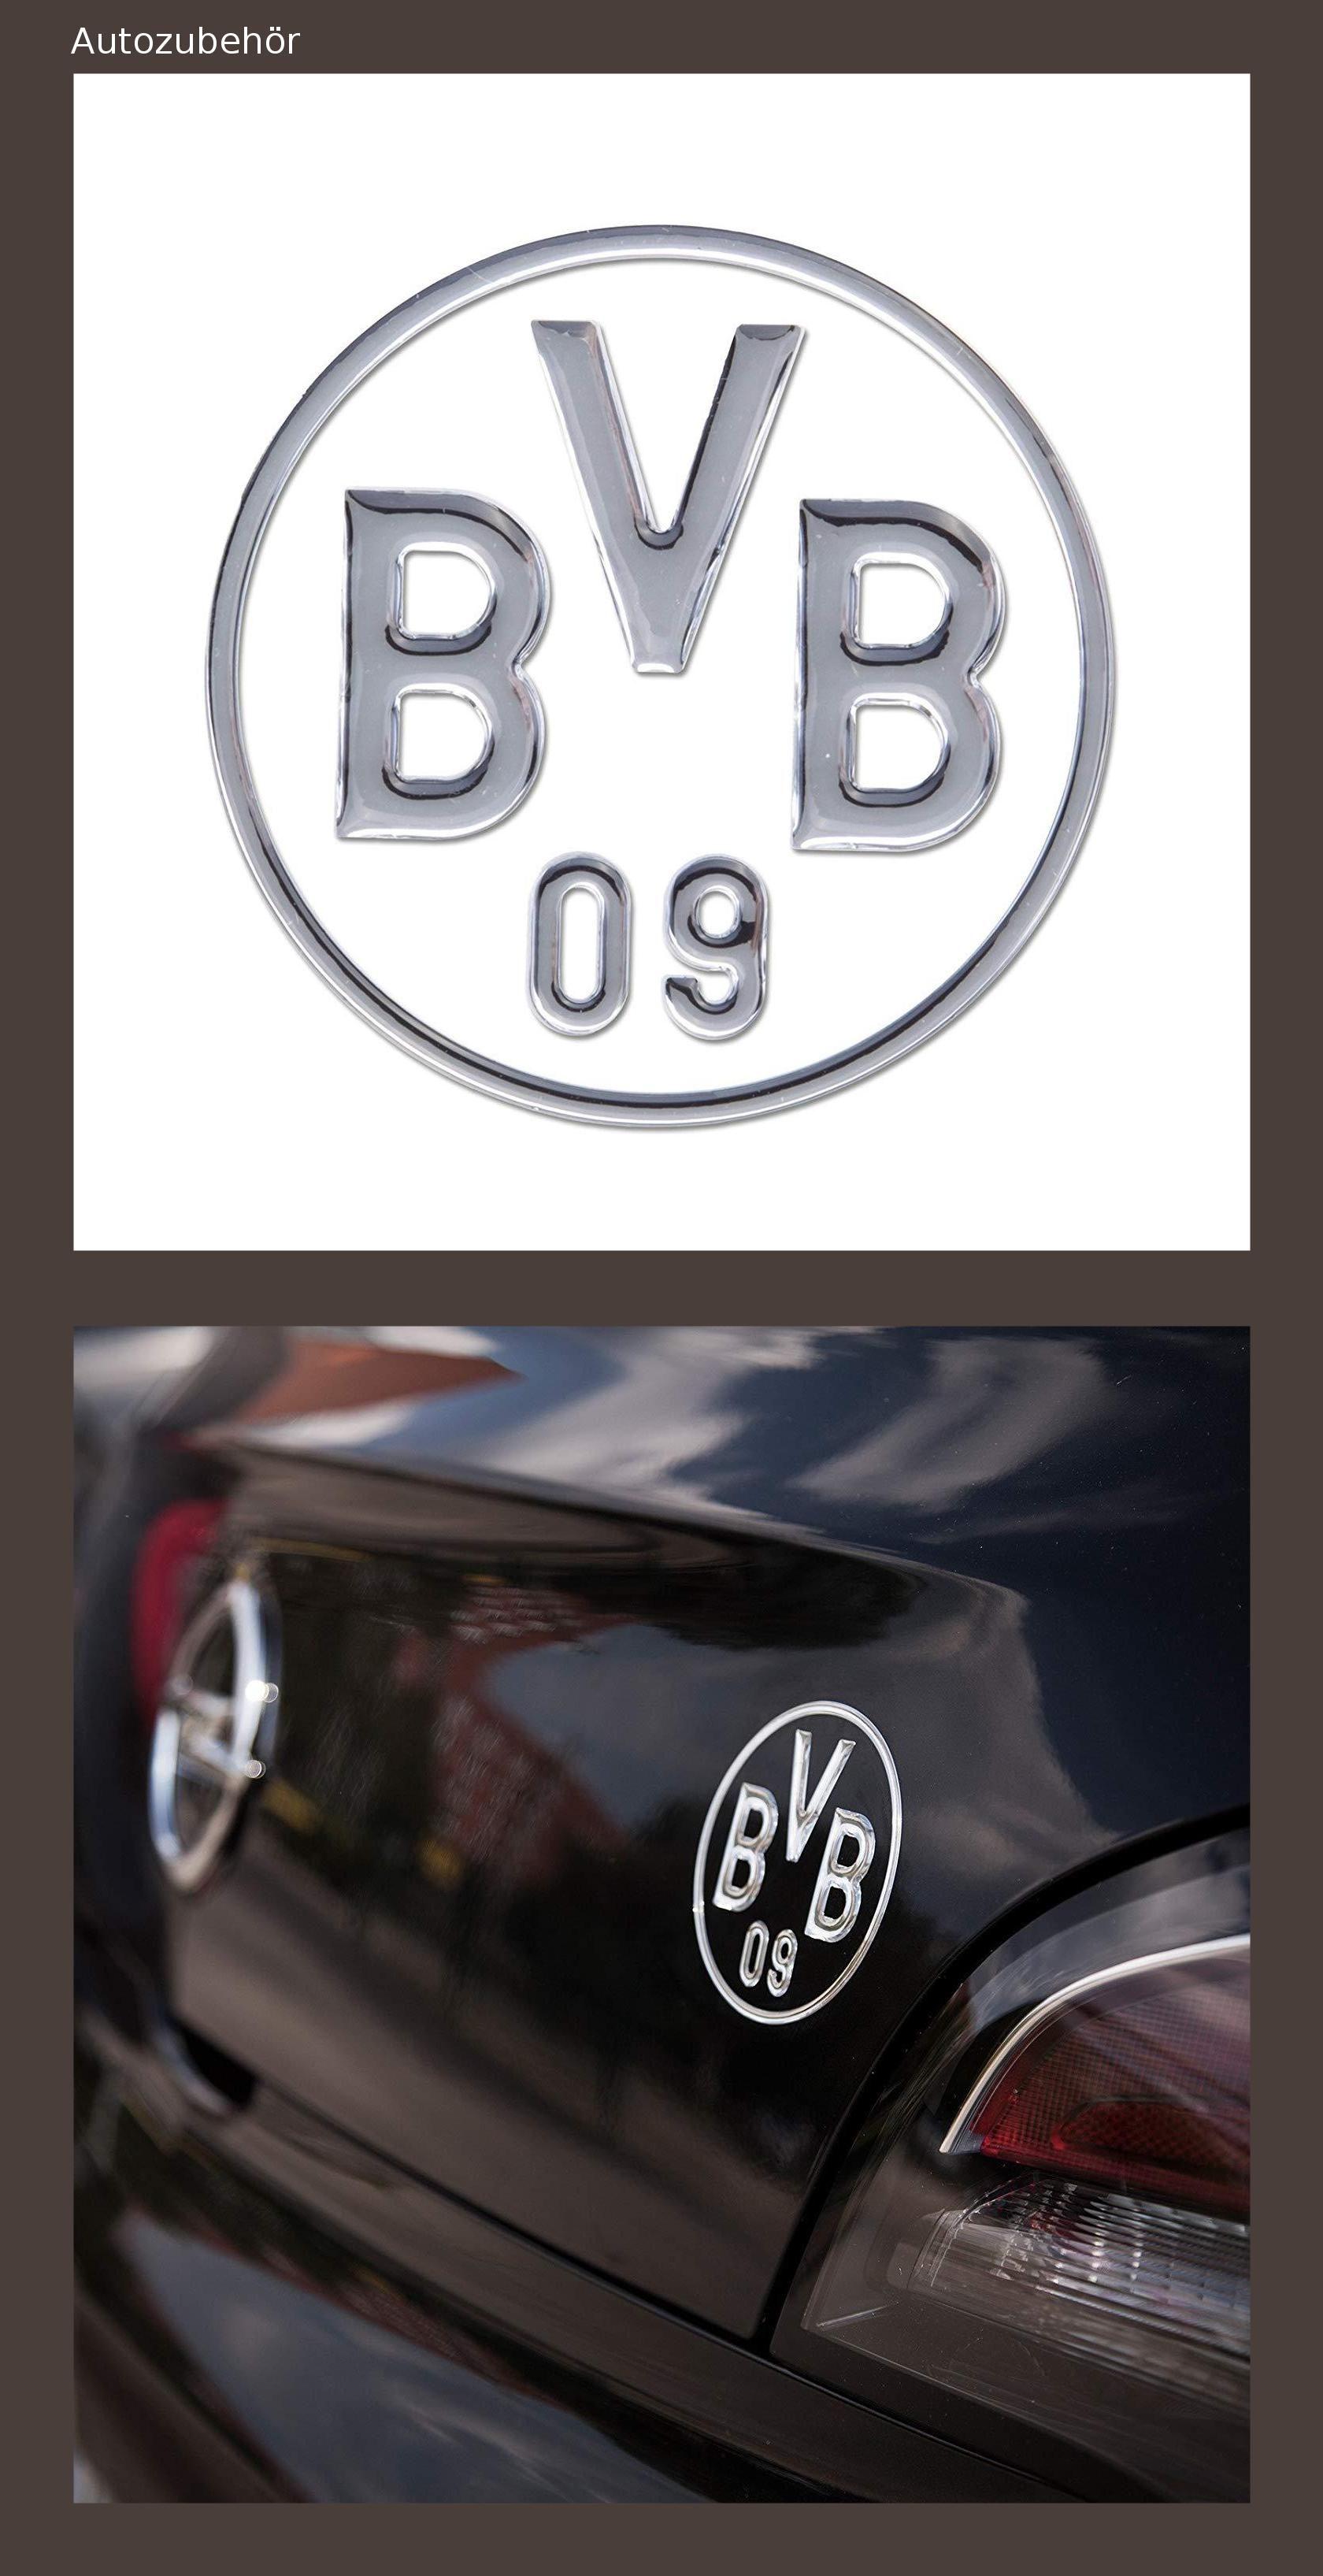 Borussia Dortmund Bvb 09 Bvb Auto Aufkleber Silber